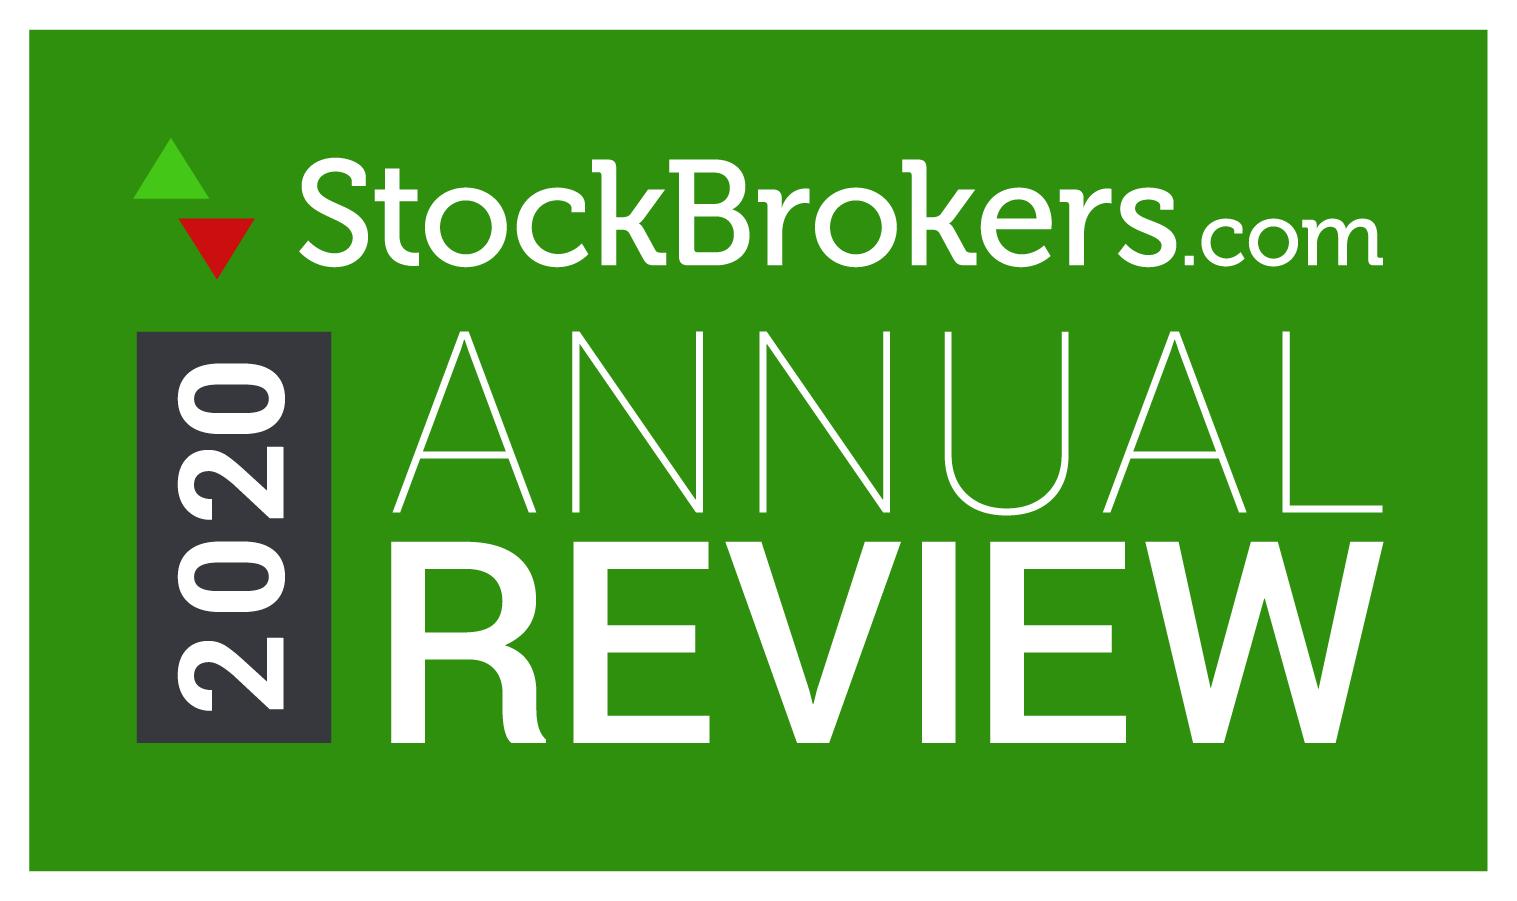 StockBrokers.com Annual Review